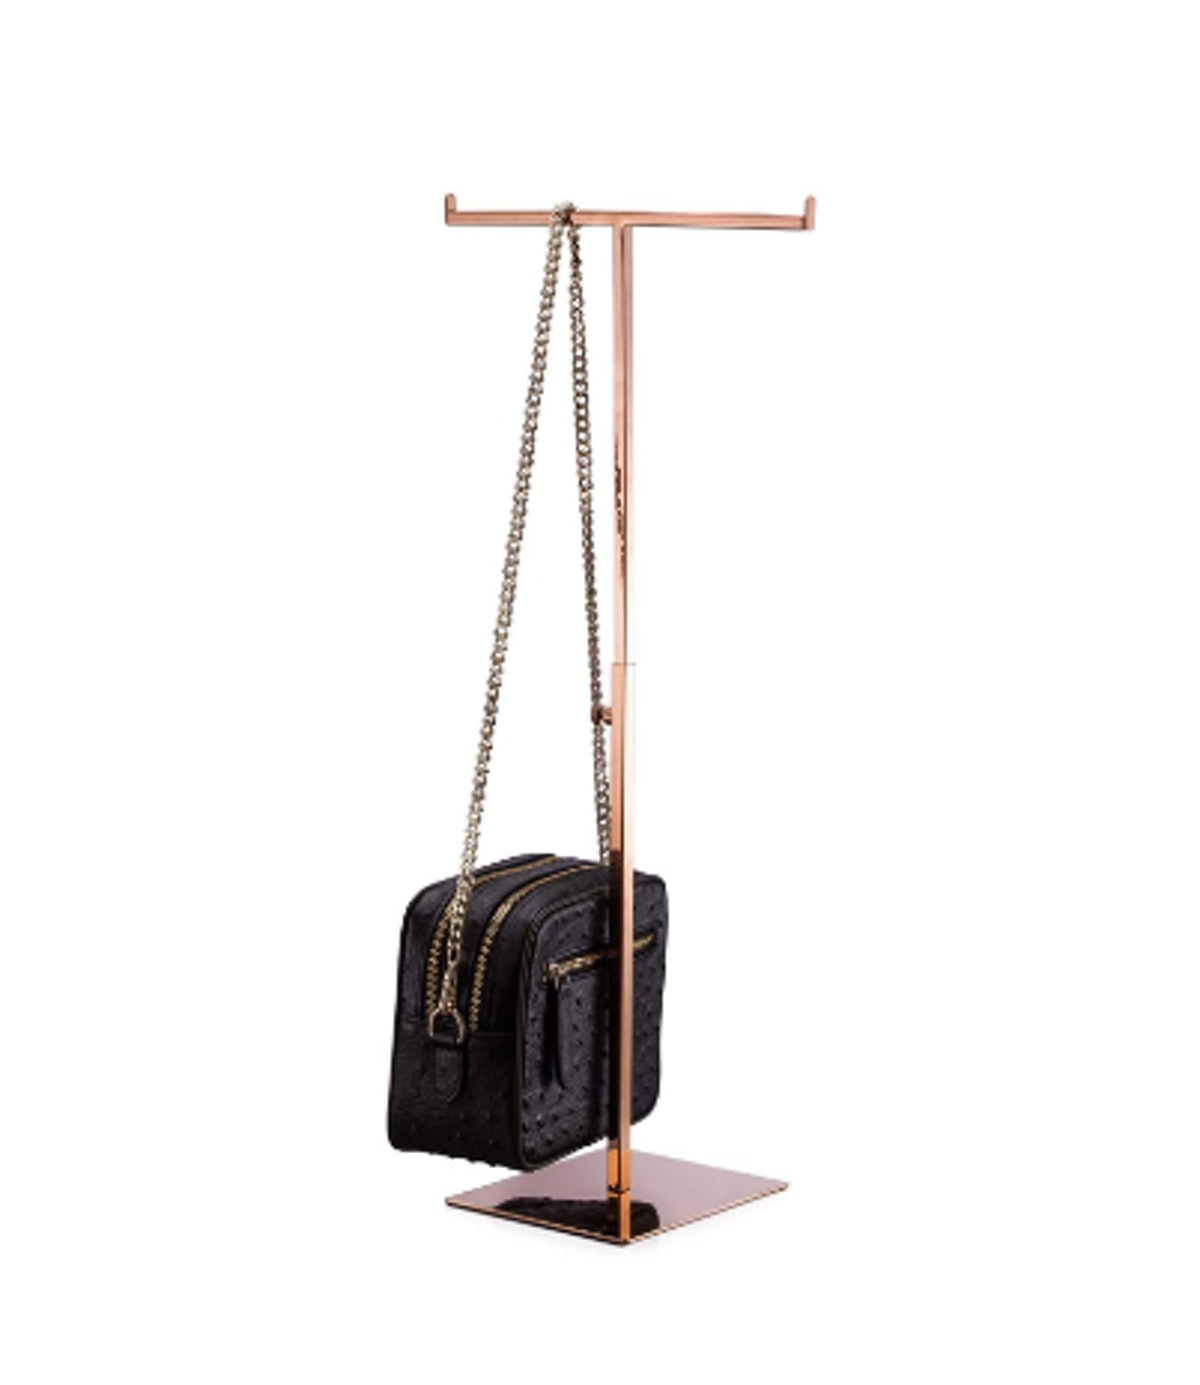 Polmart Countertop Adjustable T-Shaped Handbag Purse Display